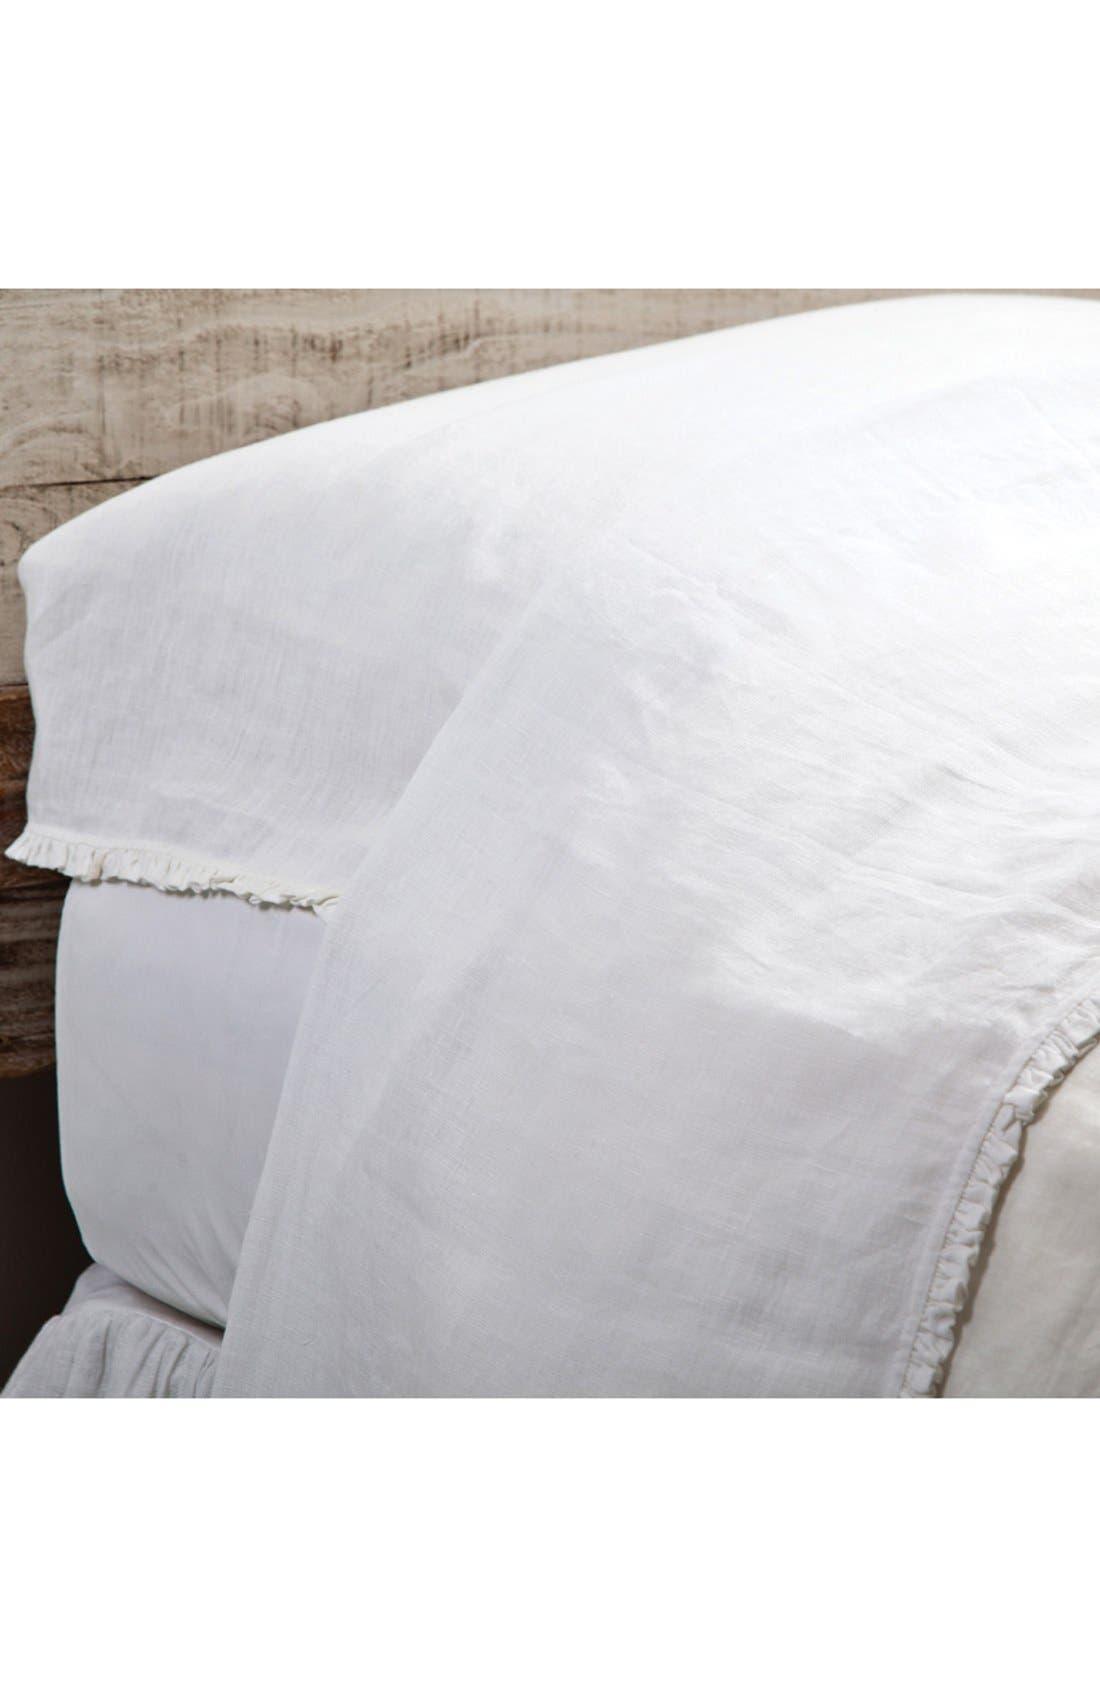 'Charlie' Linen Flat Sheet,                             Main thumbnail 1, color,                             WHITE